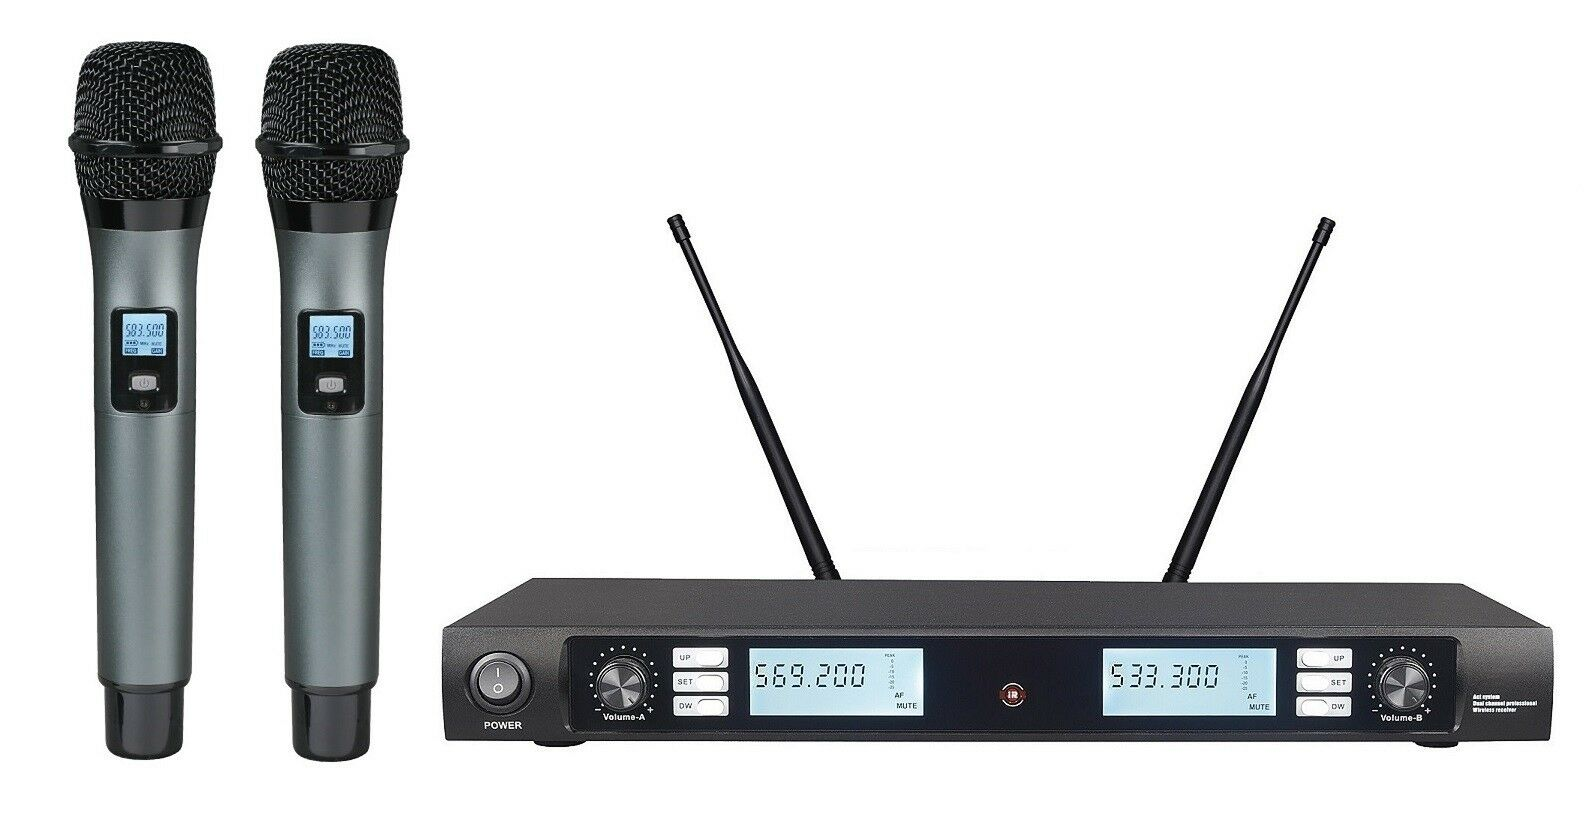 Professional UHF Wireless Cordless Microphone System for AKG Samson wireless